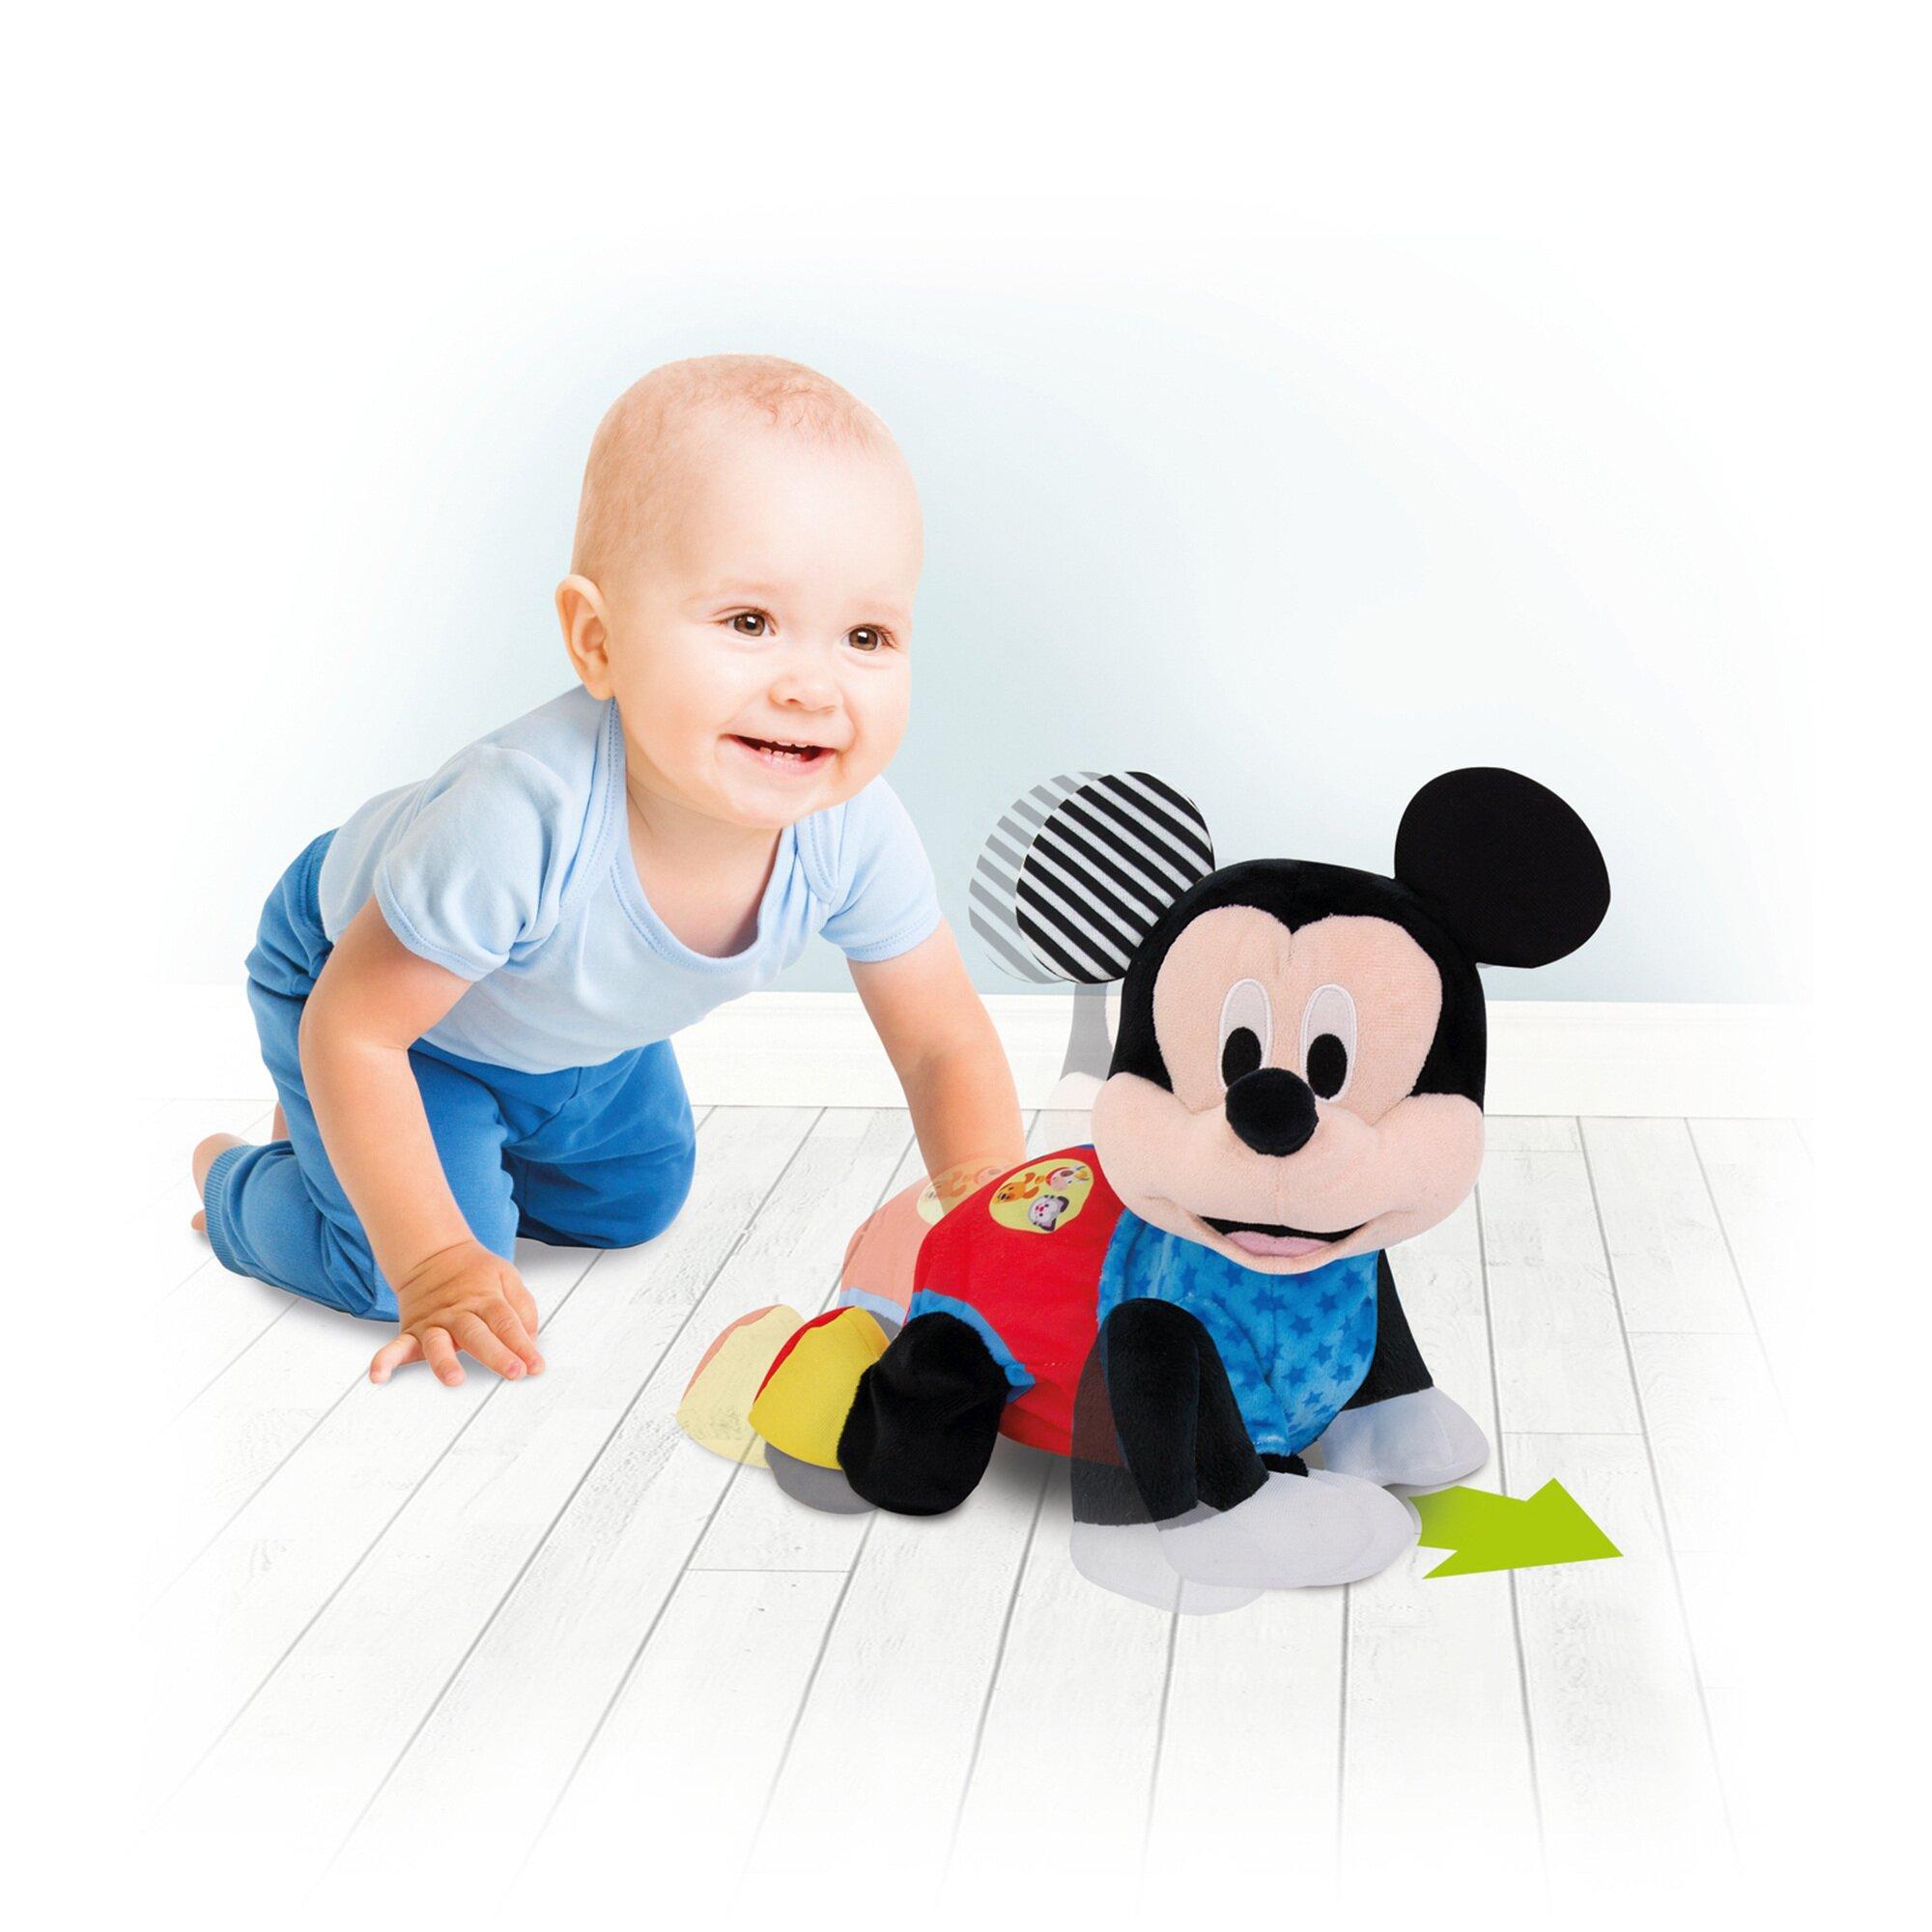 disney-baby-stoffspielzeug-baby-mickey-krabbel-mit-mir